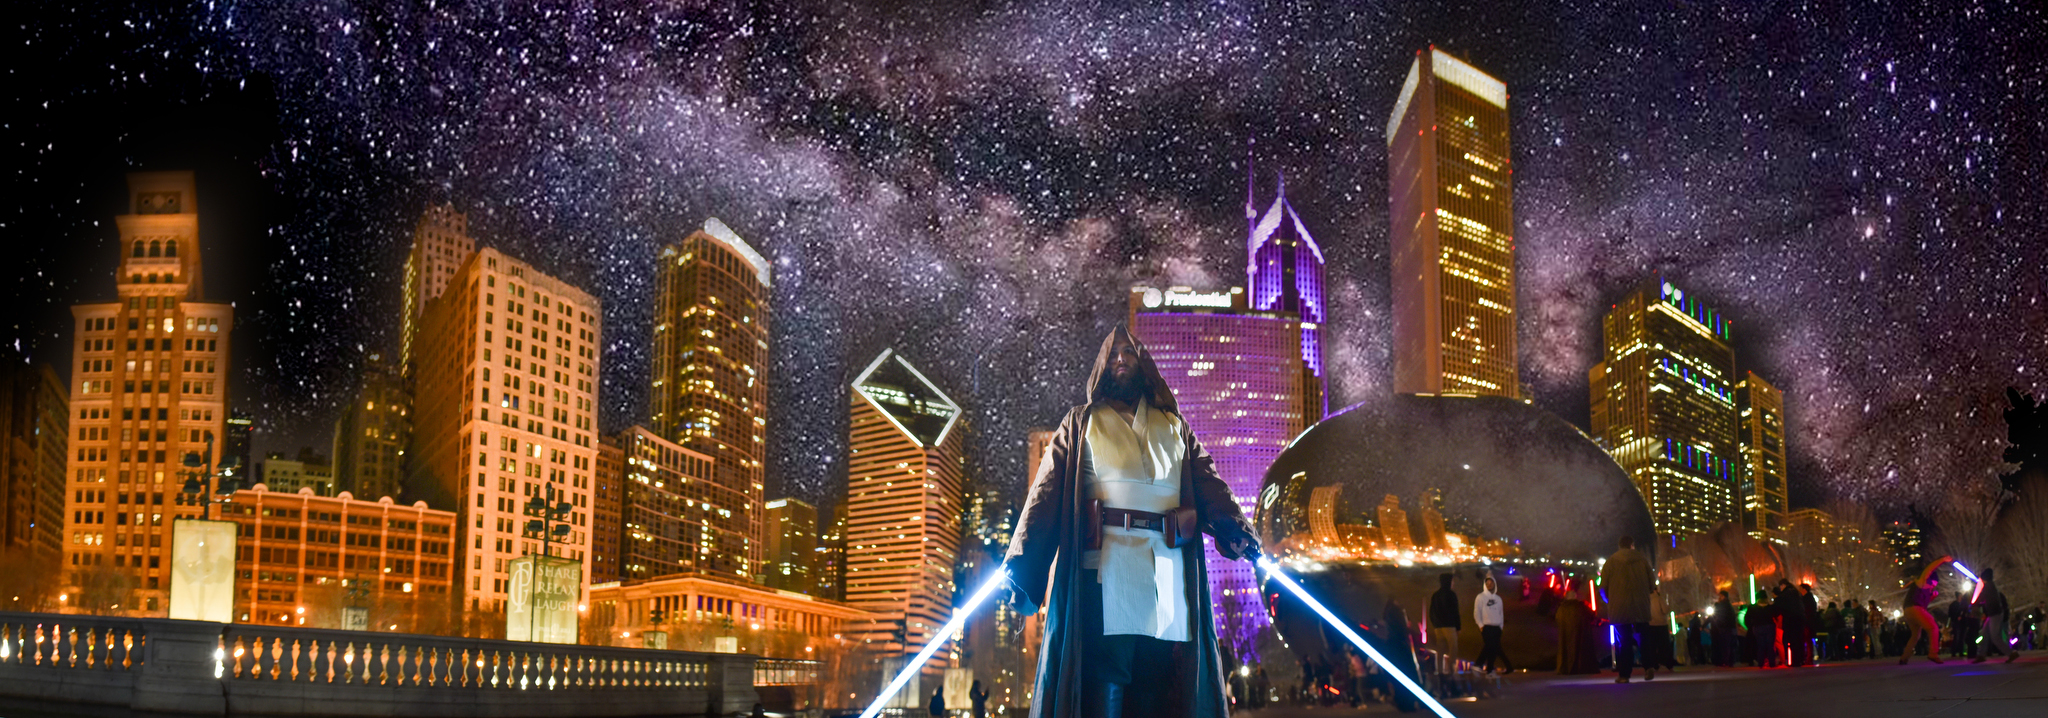 2019.04.14 - Star Wars Celebration Chicago 288846.JPG